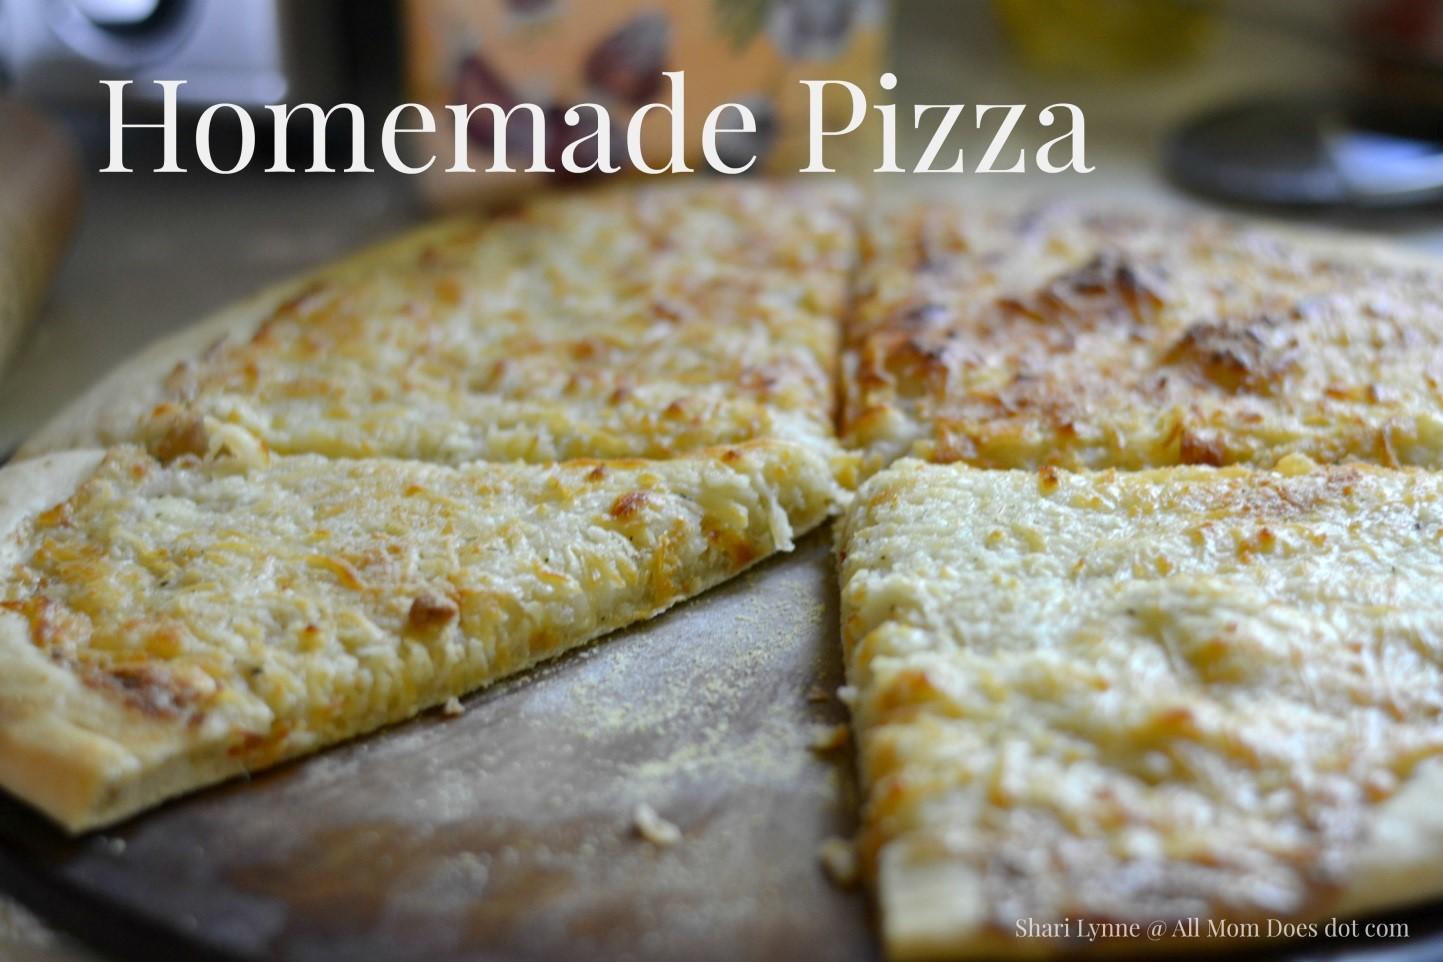 Recipe: Homemade Pizza